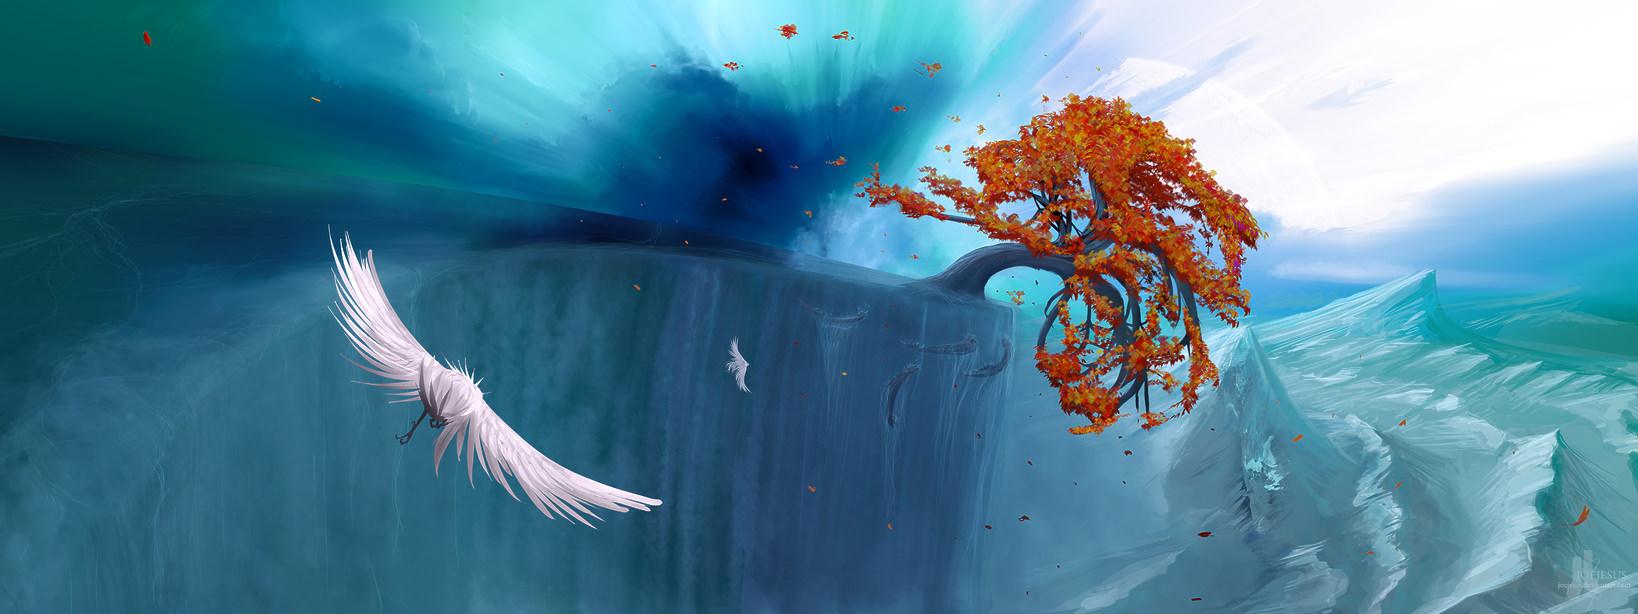 beautiful autumn fall wallpaper